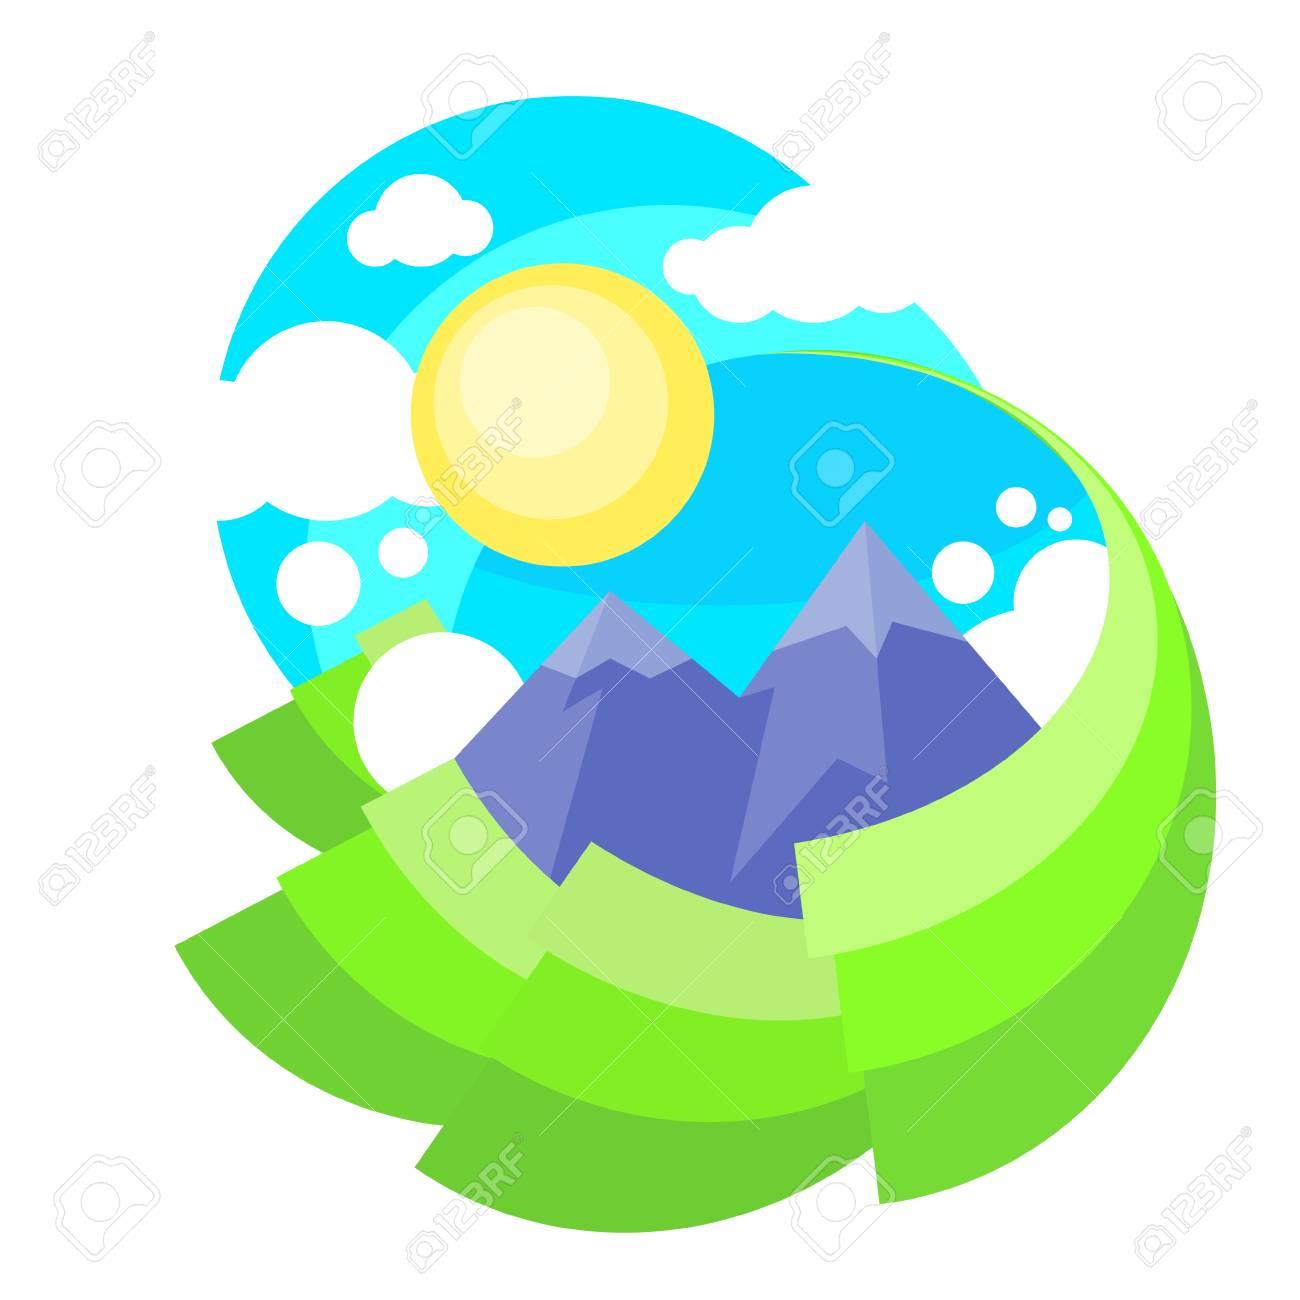 mountain green grass with sun landscape royalty free cliparts rh 123rf com Grass SVG Grass SVG